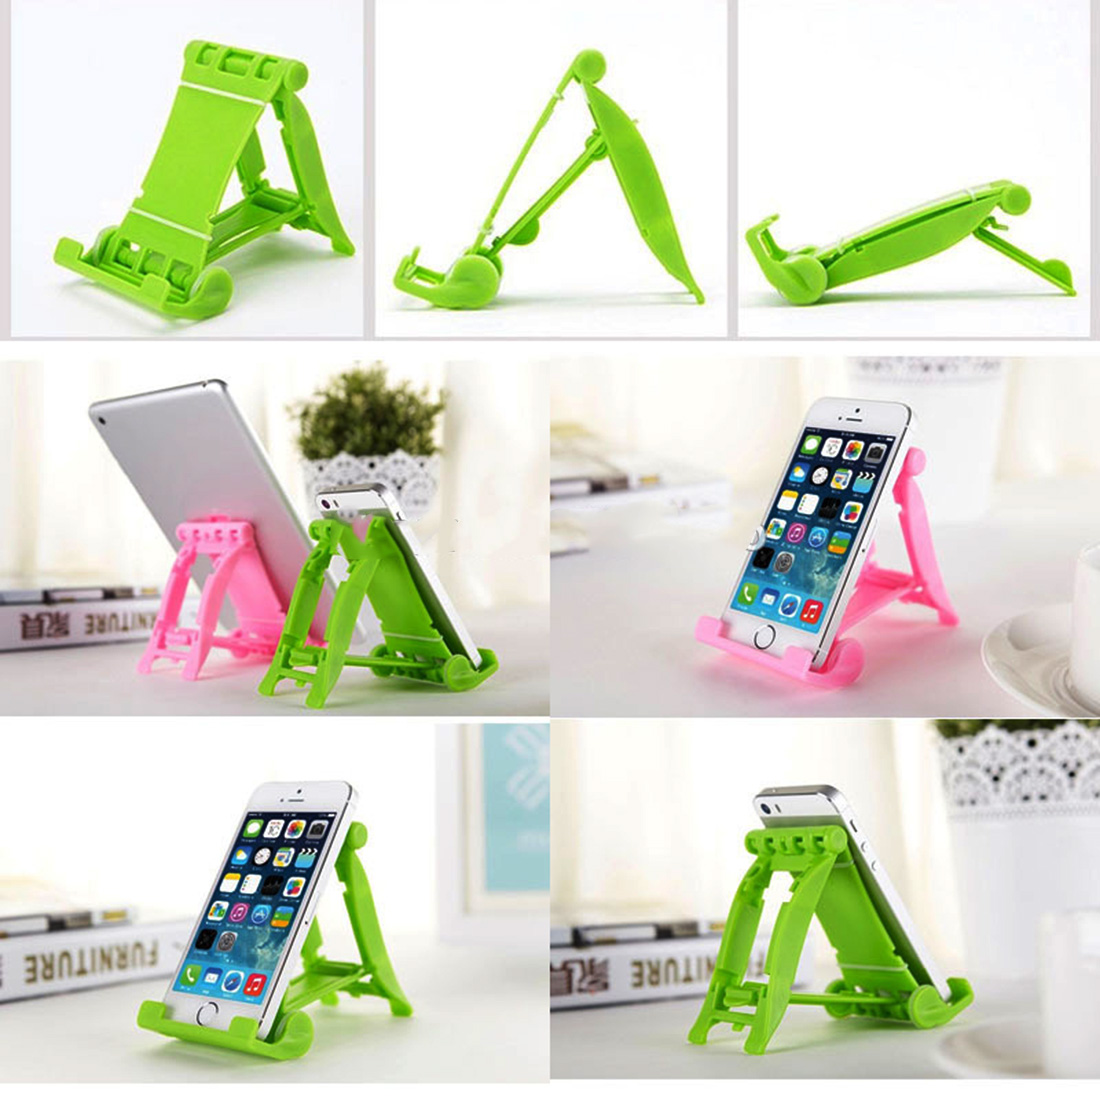 Etmakit Good Sale Diverse Colors Universal Portable Colorful Phone Holder Foldable Mobile Phone Stents Stand Multi-Colors